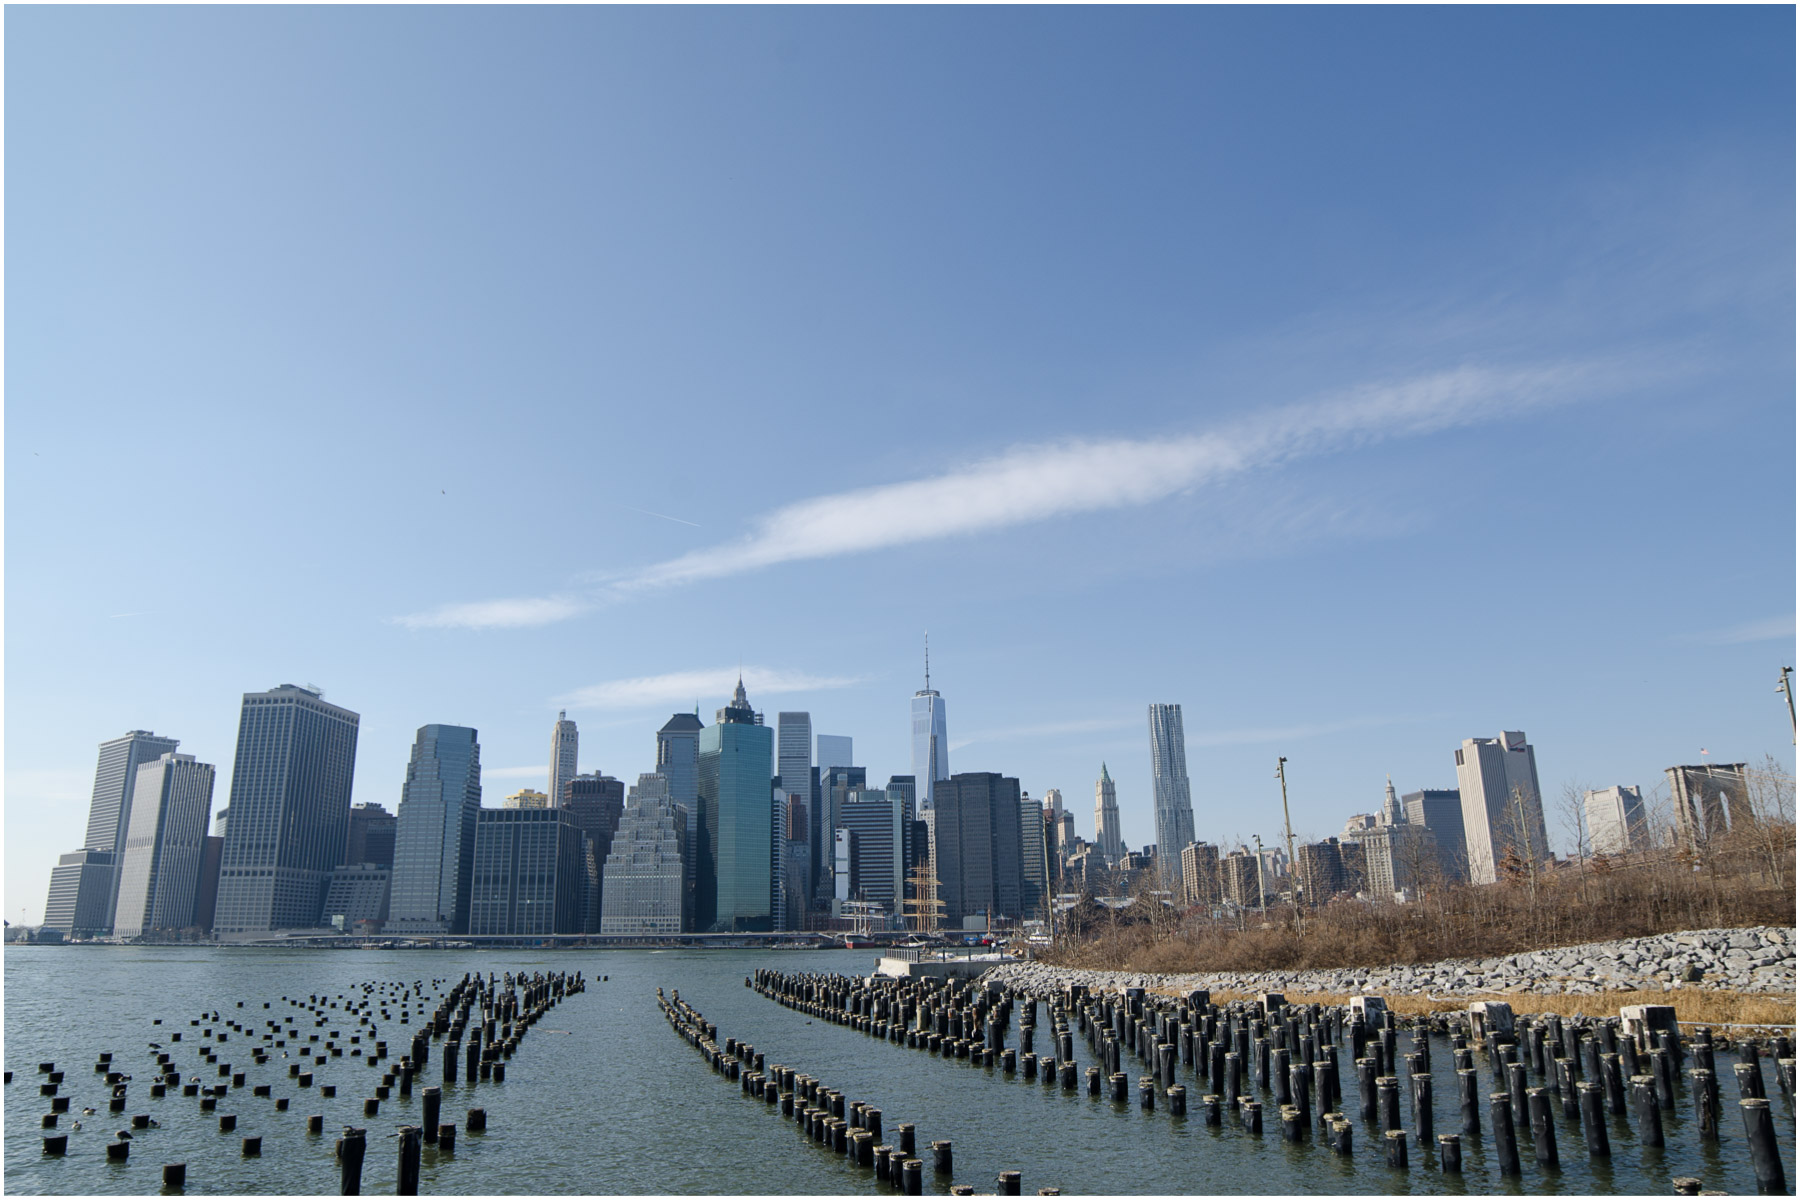 Crossing-the-Brooklyn-Bridge_6.jpg